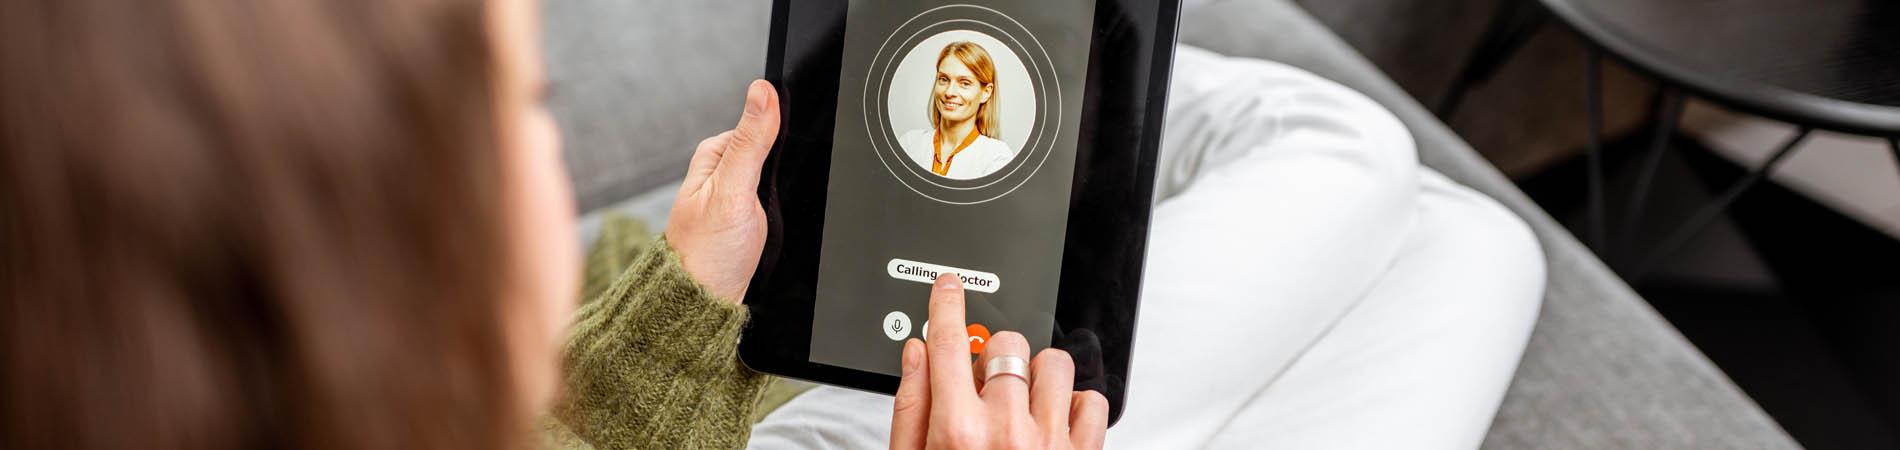 Pateint engagement shown through a telehealth visit